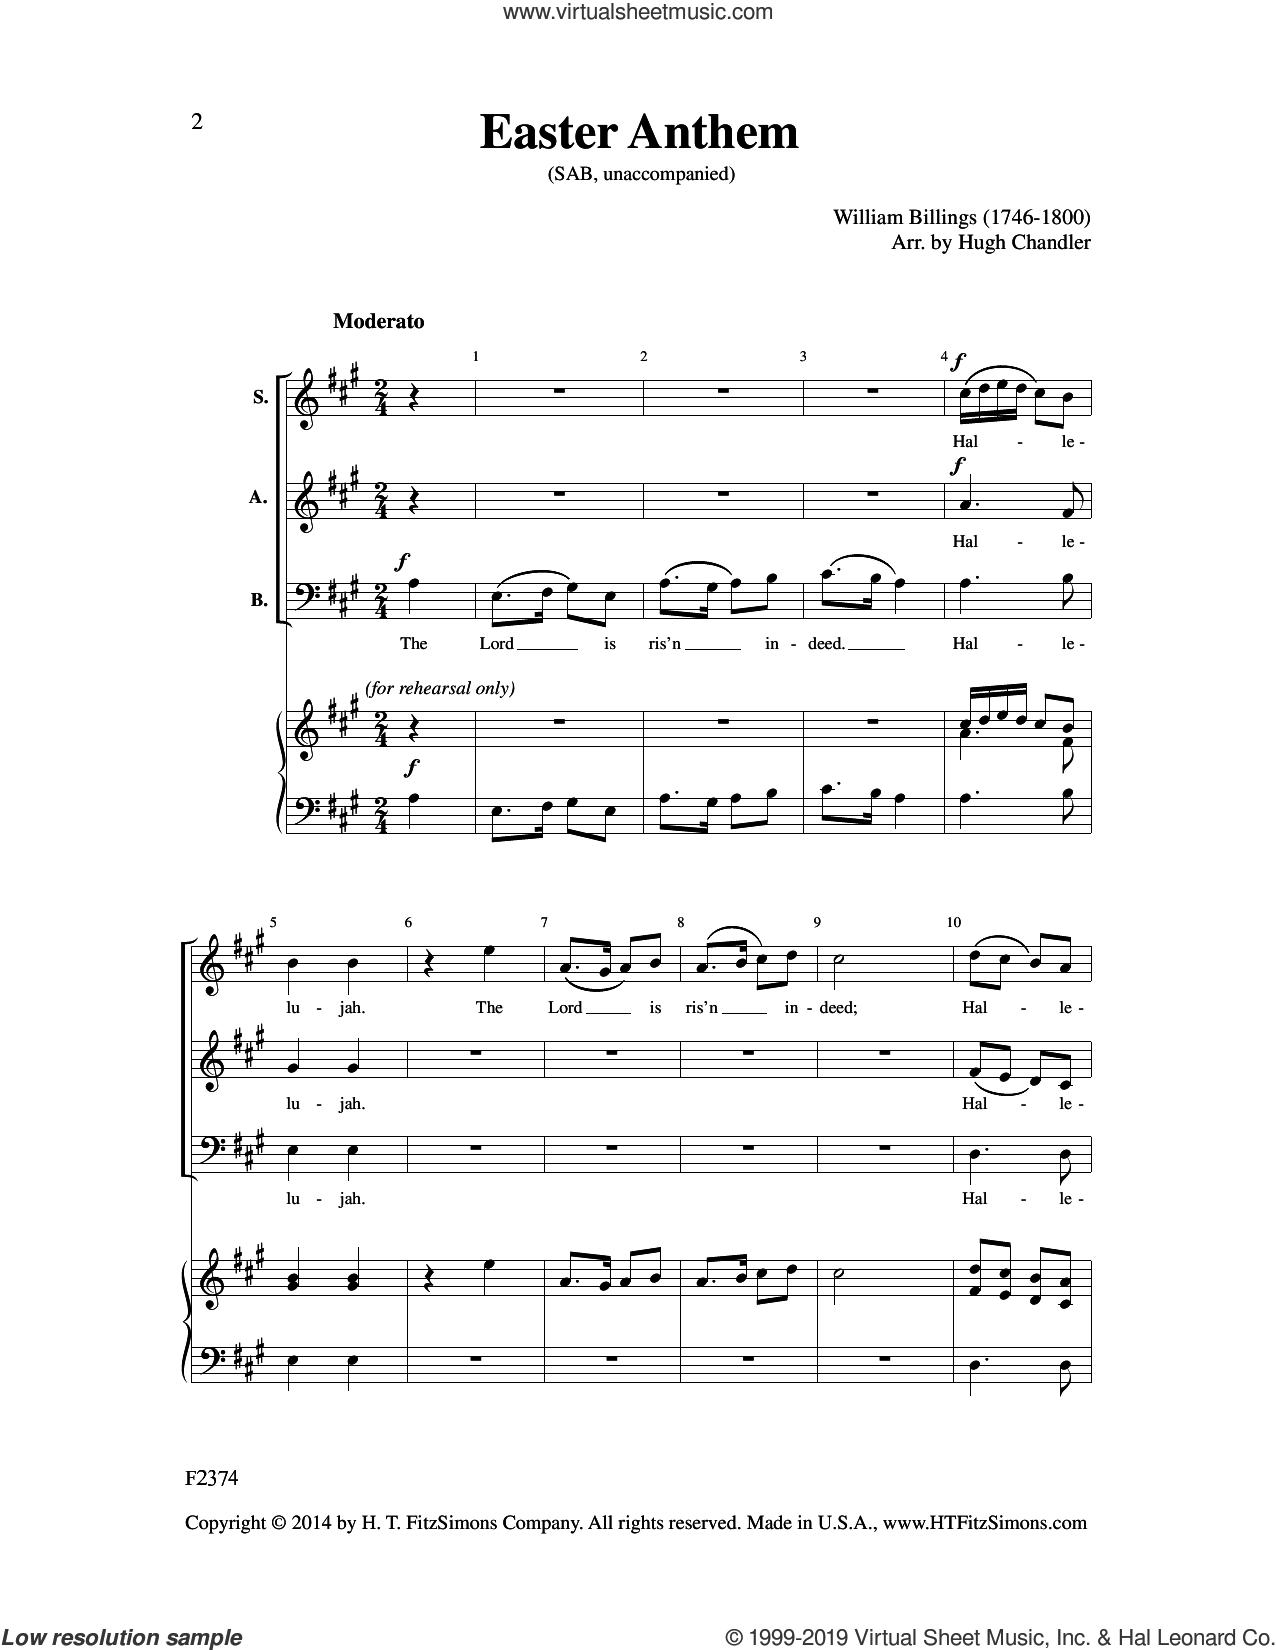 Easter Anthem (arr. Hugh Chandler) sheet music for choir (SAB: soprano, alto, bass) by William Billings and Hugh Chandler, intermediate skill level